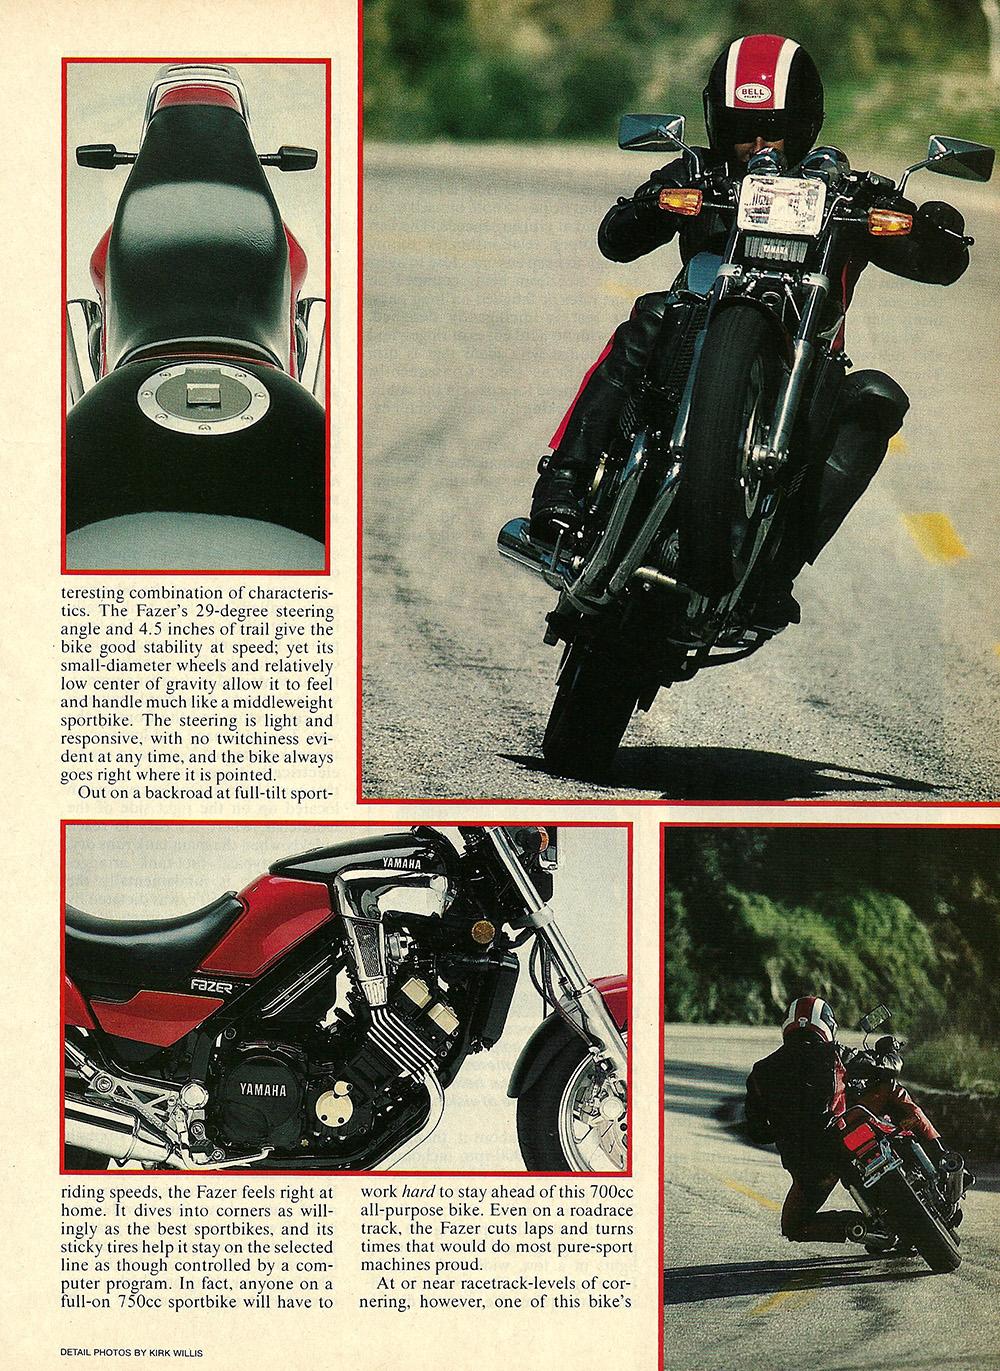 1986 Yamaha Fazer FZX700 road test 04.jpg